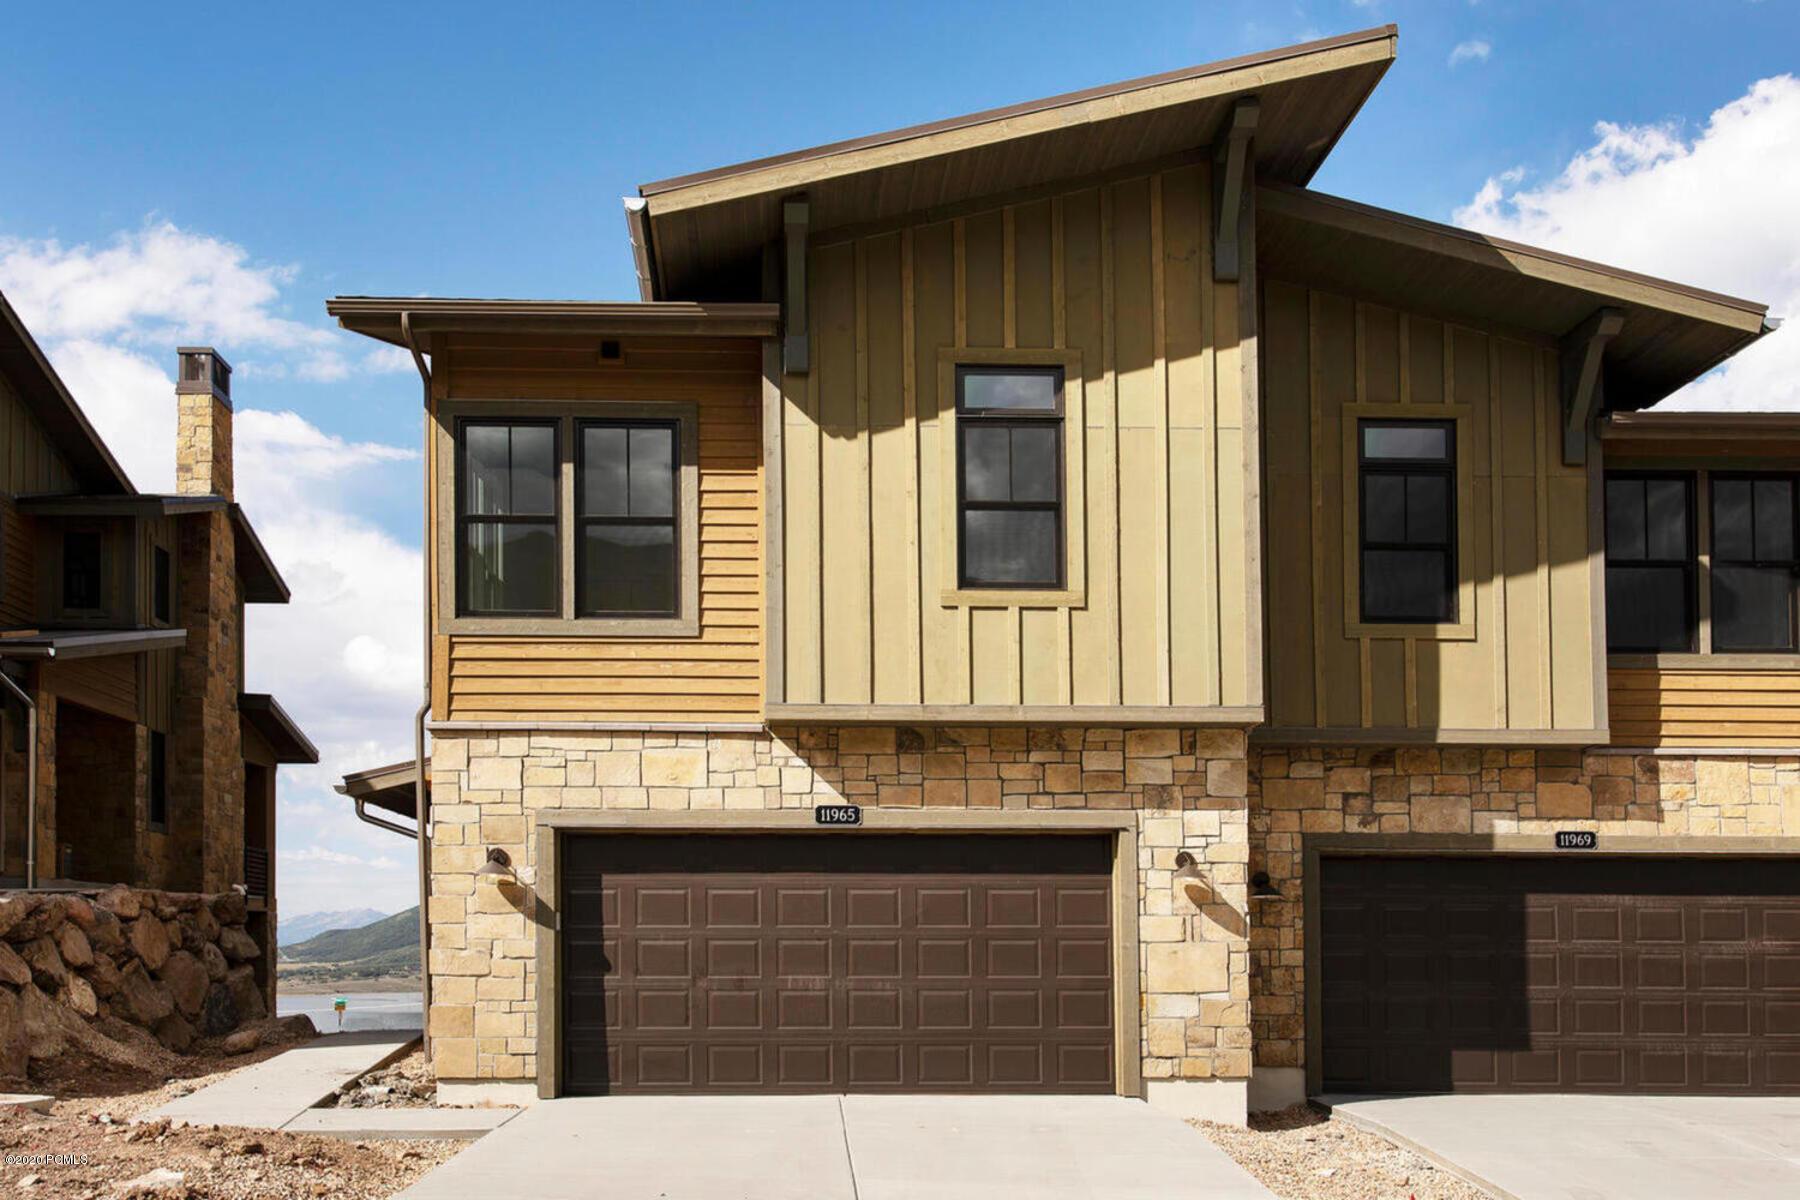 11935 Shoreline Dr, Lot 7, Hideout, Utah 84036, 4 Bedrooms Bedrooms, ,4 BathroomsBathrooms,Condominium,For Sale,Shoreline Dr, Lot 7,12003686